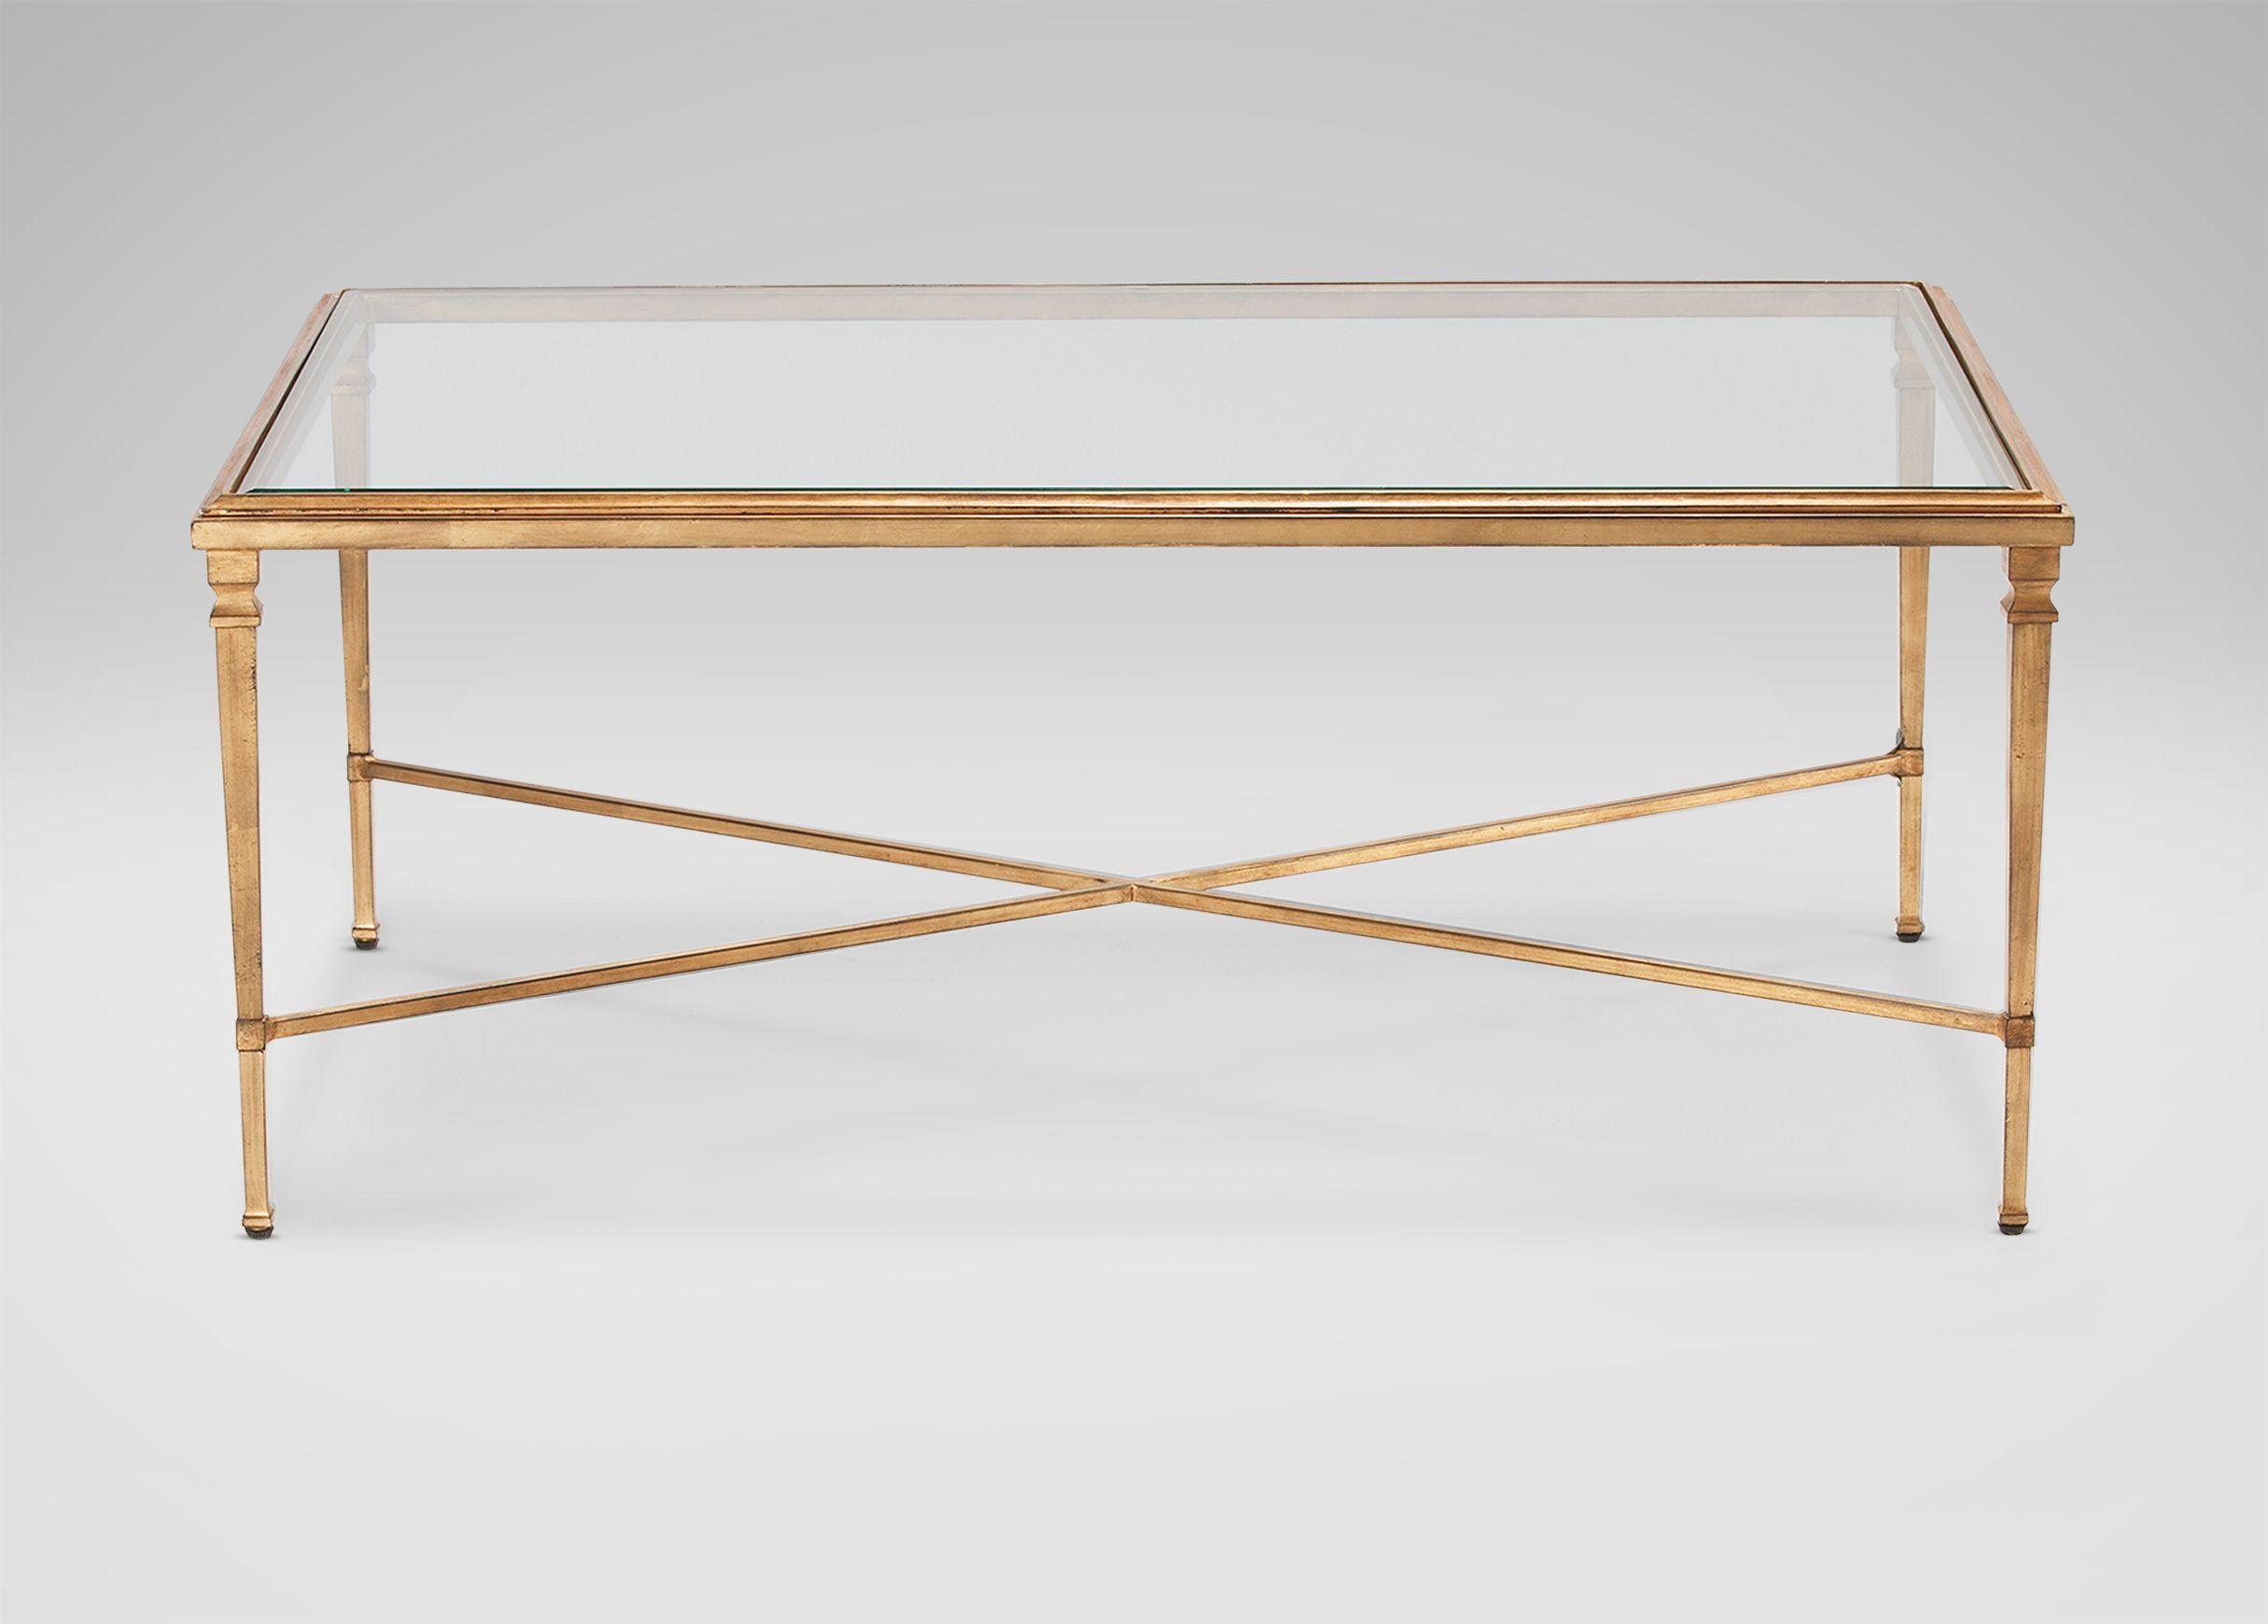 Rectangular Heron Coffee Table Coffee Tables Rectangular Glass Coffee Table Glass Coffee Table Coffee Table [ 1740 x 2430 Pixel ]